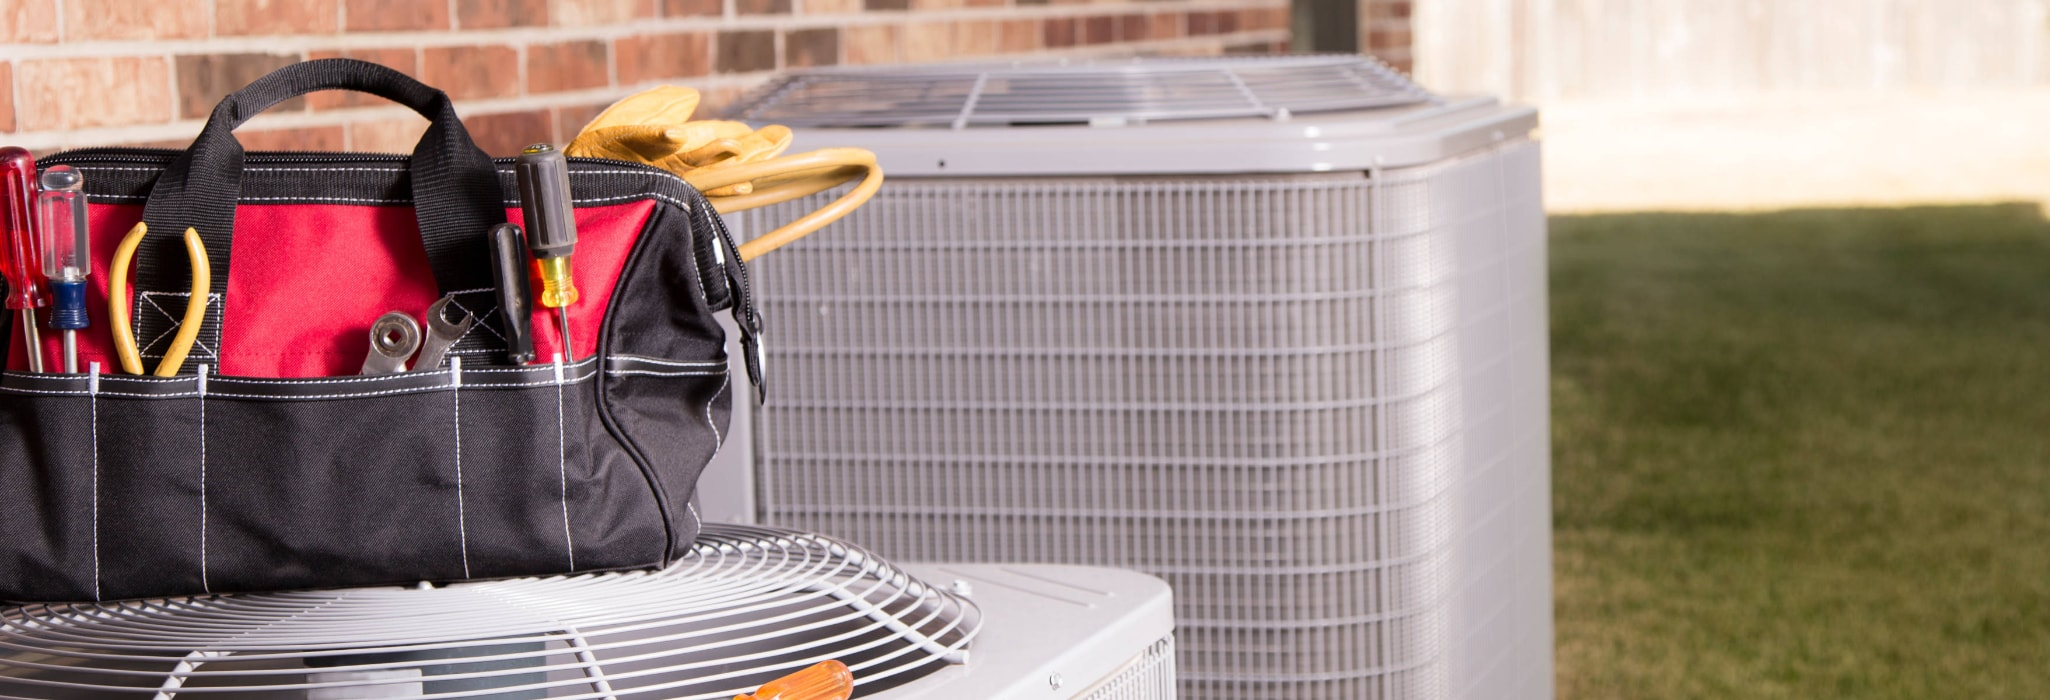 Air conditioner maintenance.